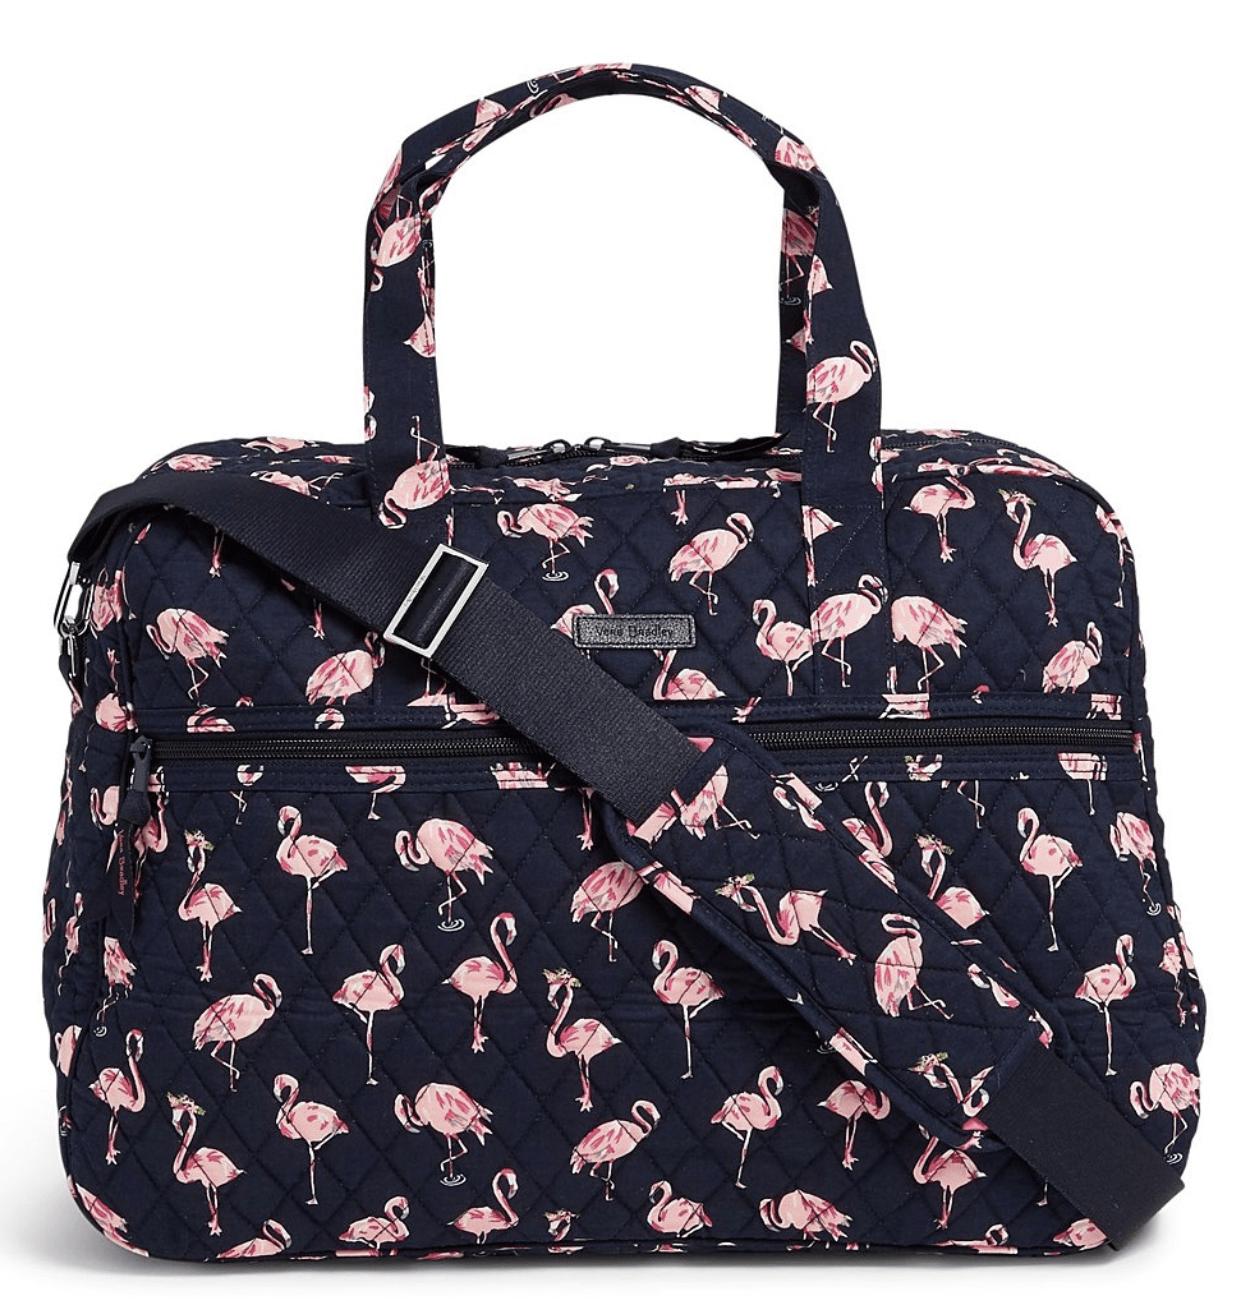 Vera Bradley Traveler Bag